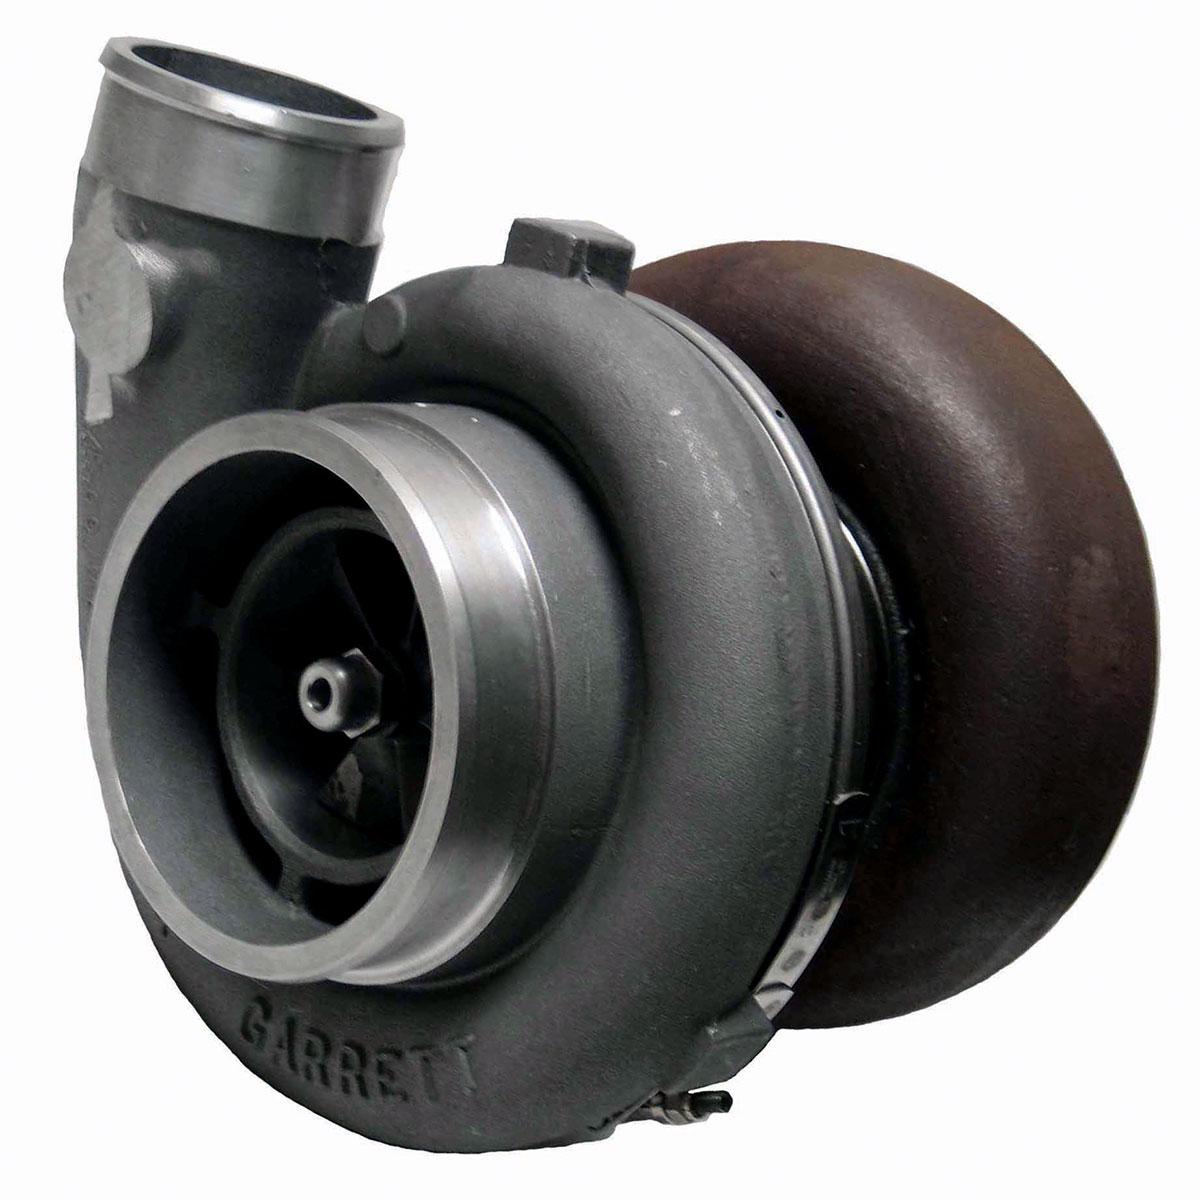 Garrett Releases Line Of Gtw Turbo Turbochargers: Garrett GT3071R Turbocharger